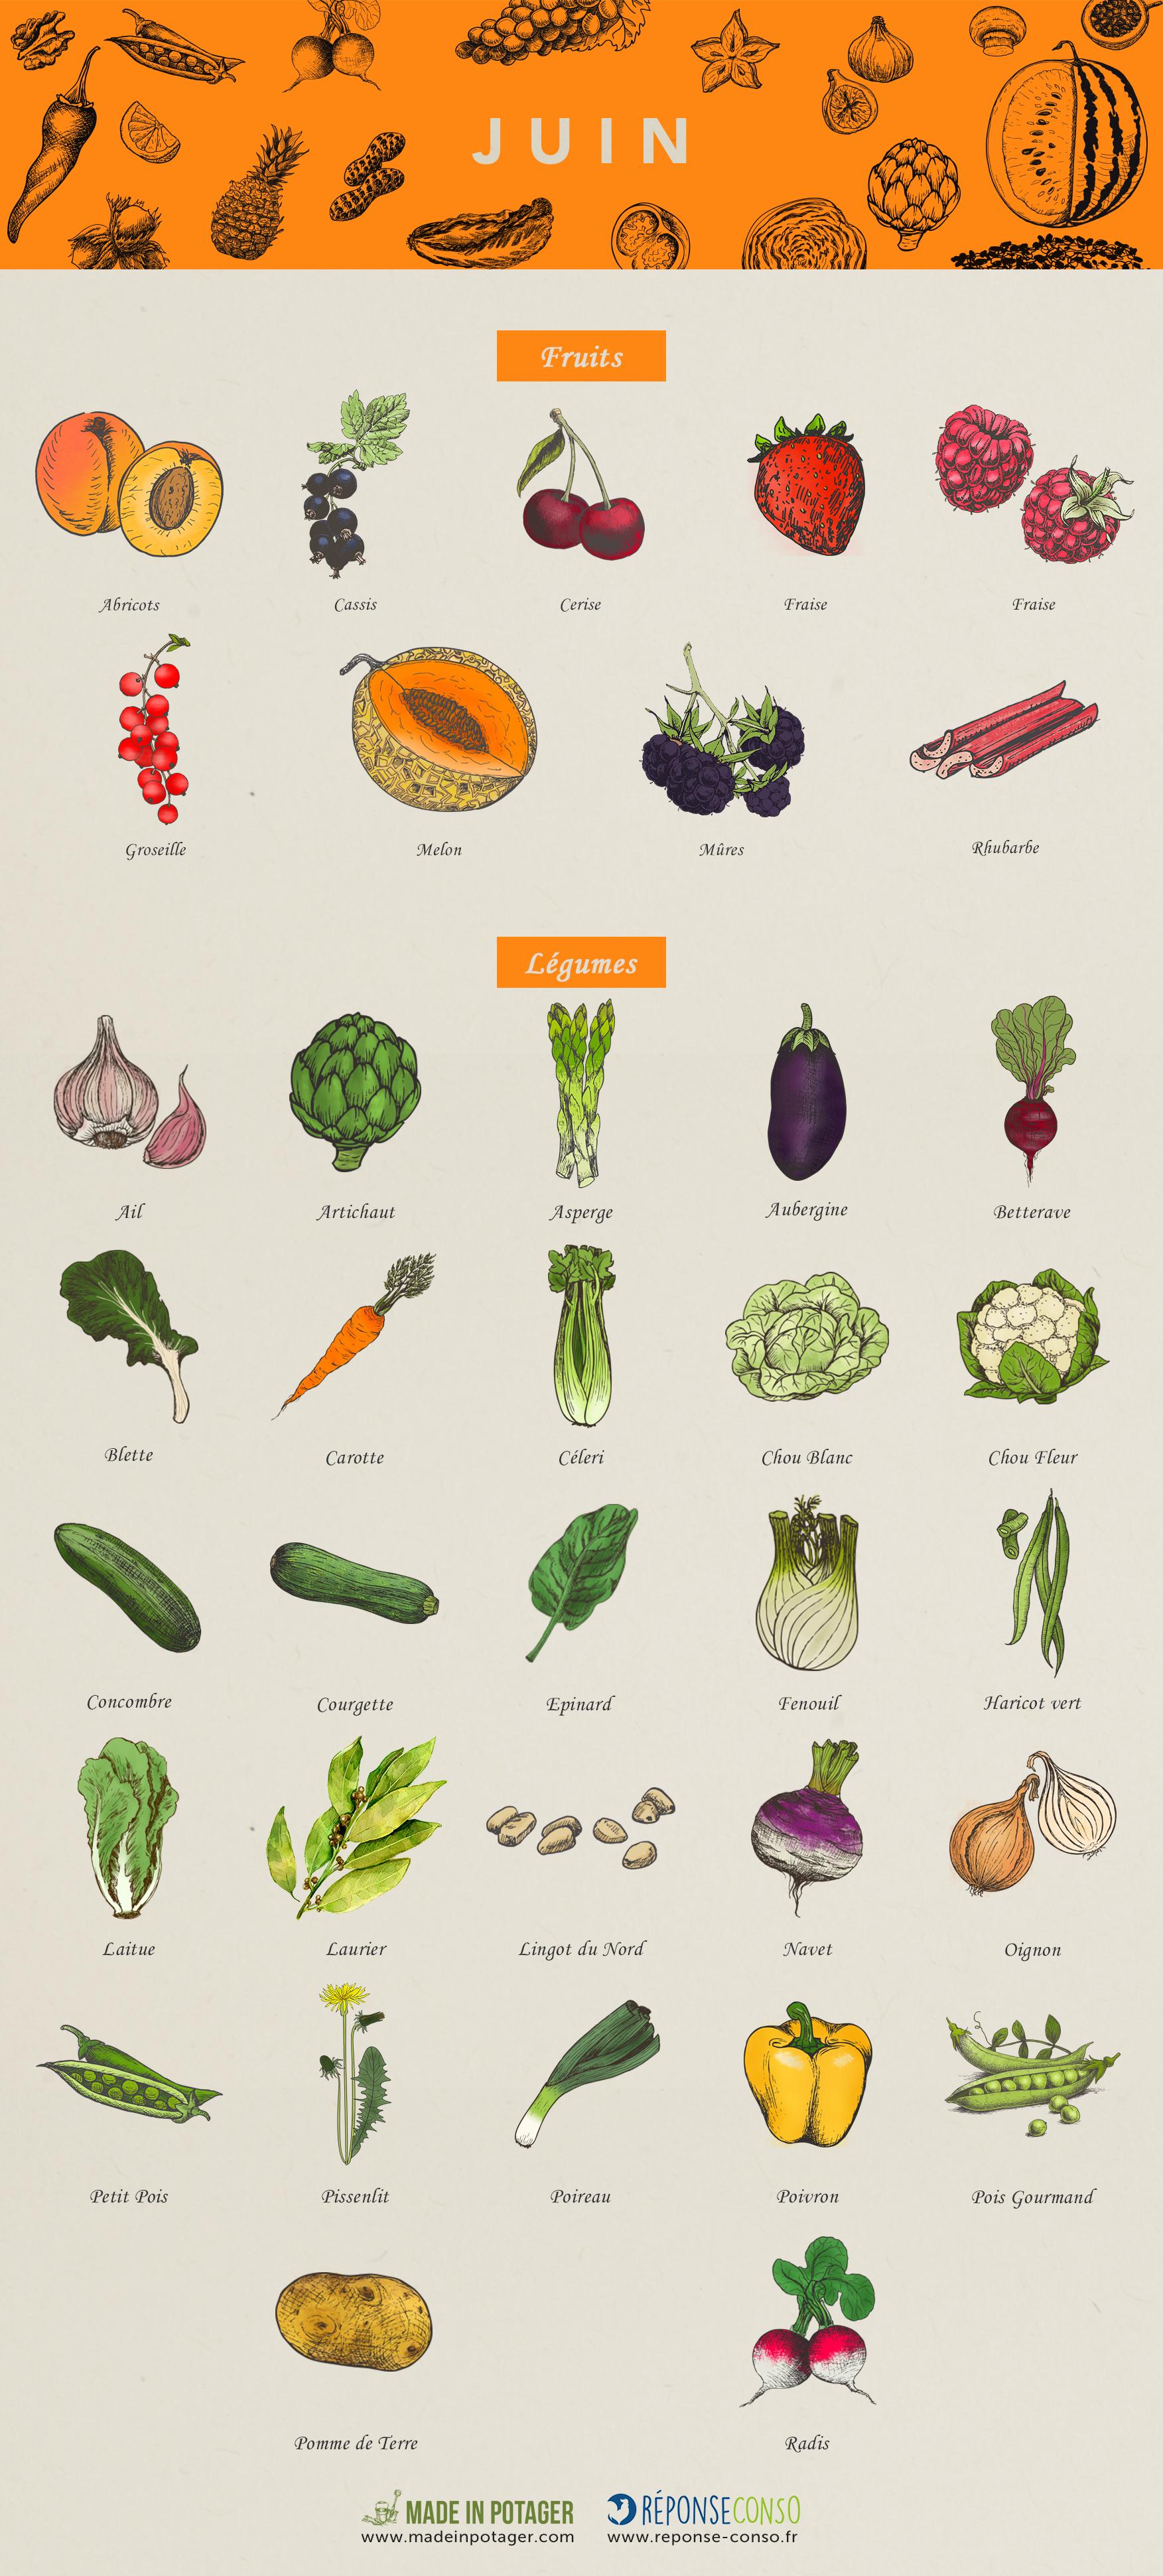 Calendrier Fruits Legumes.Calendrier Fruits Legumes Juin Ok Reponse Conso